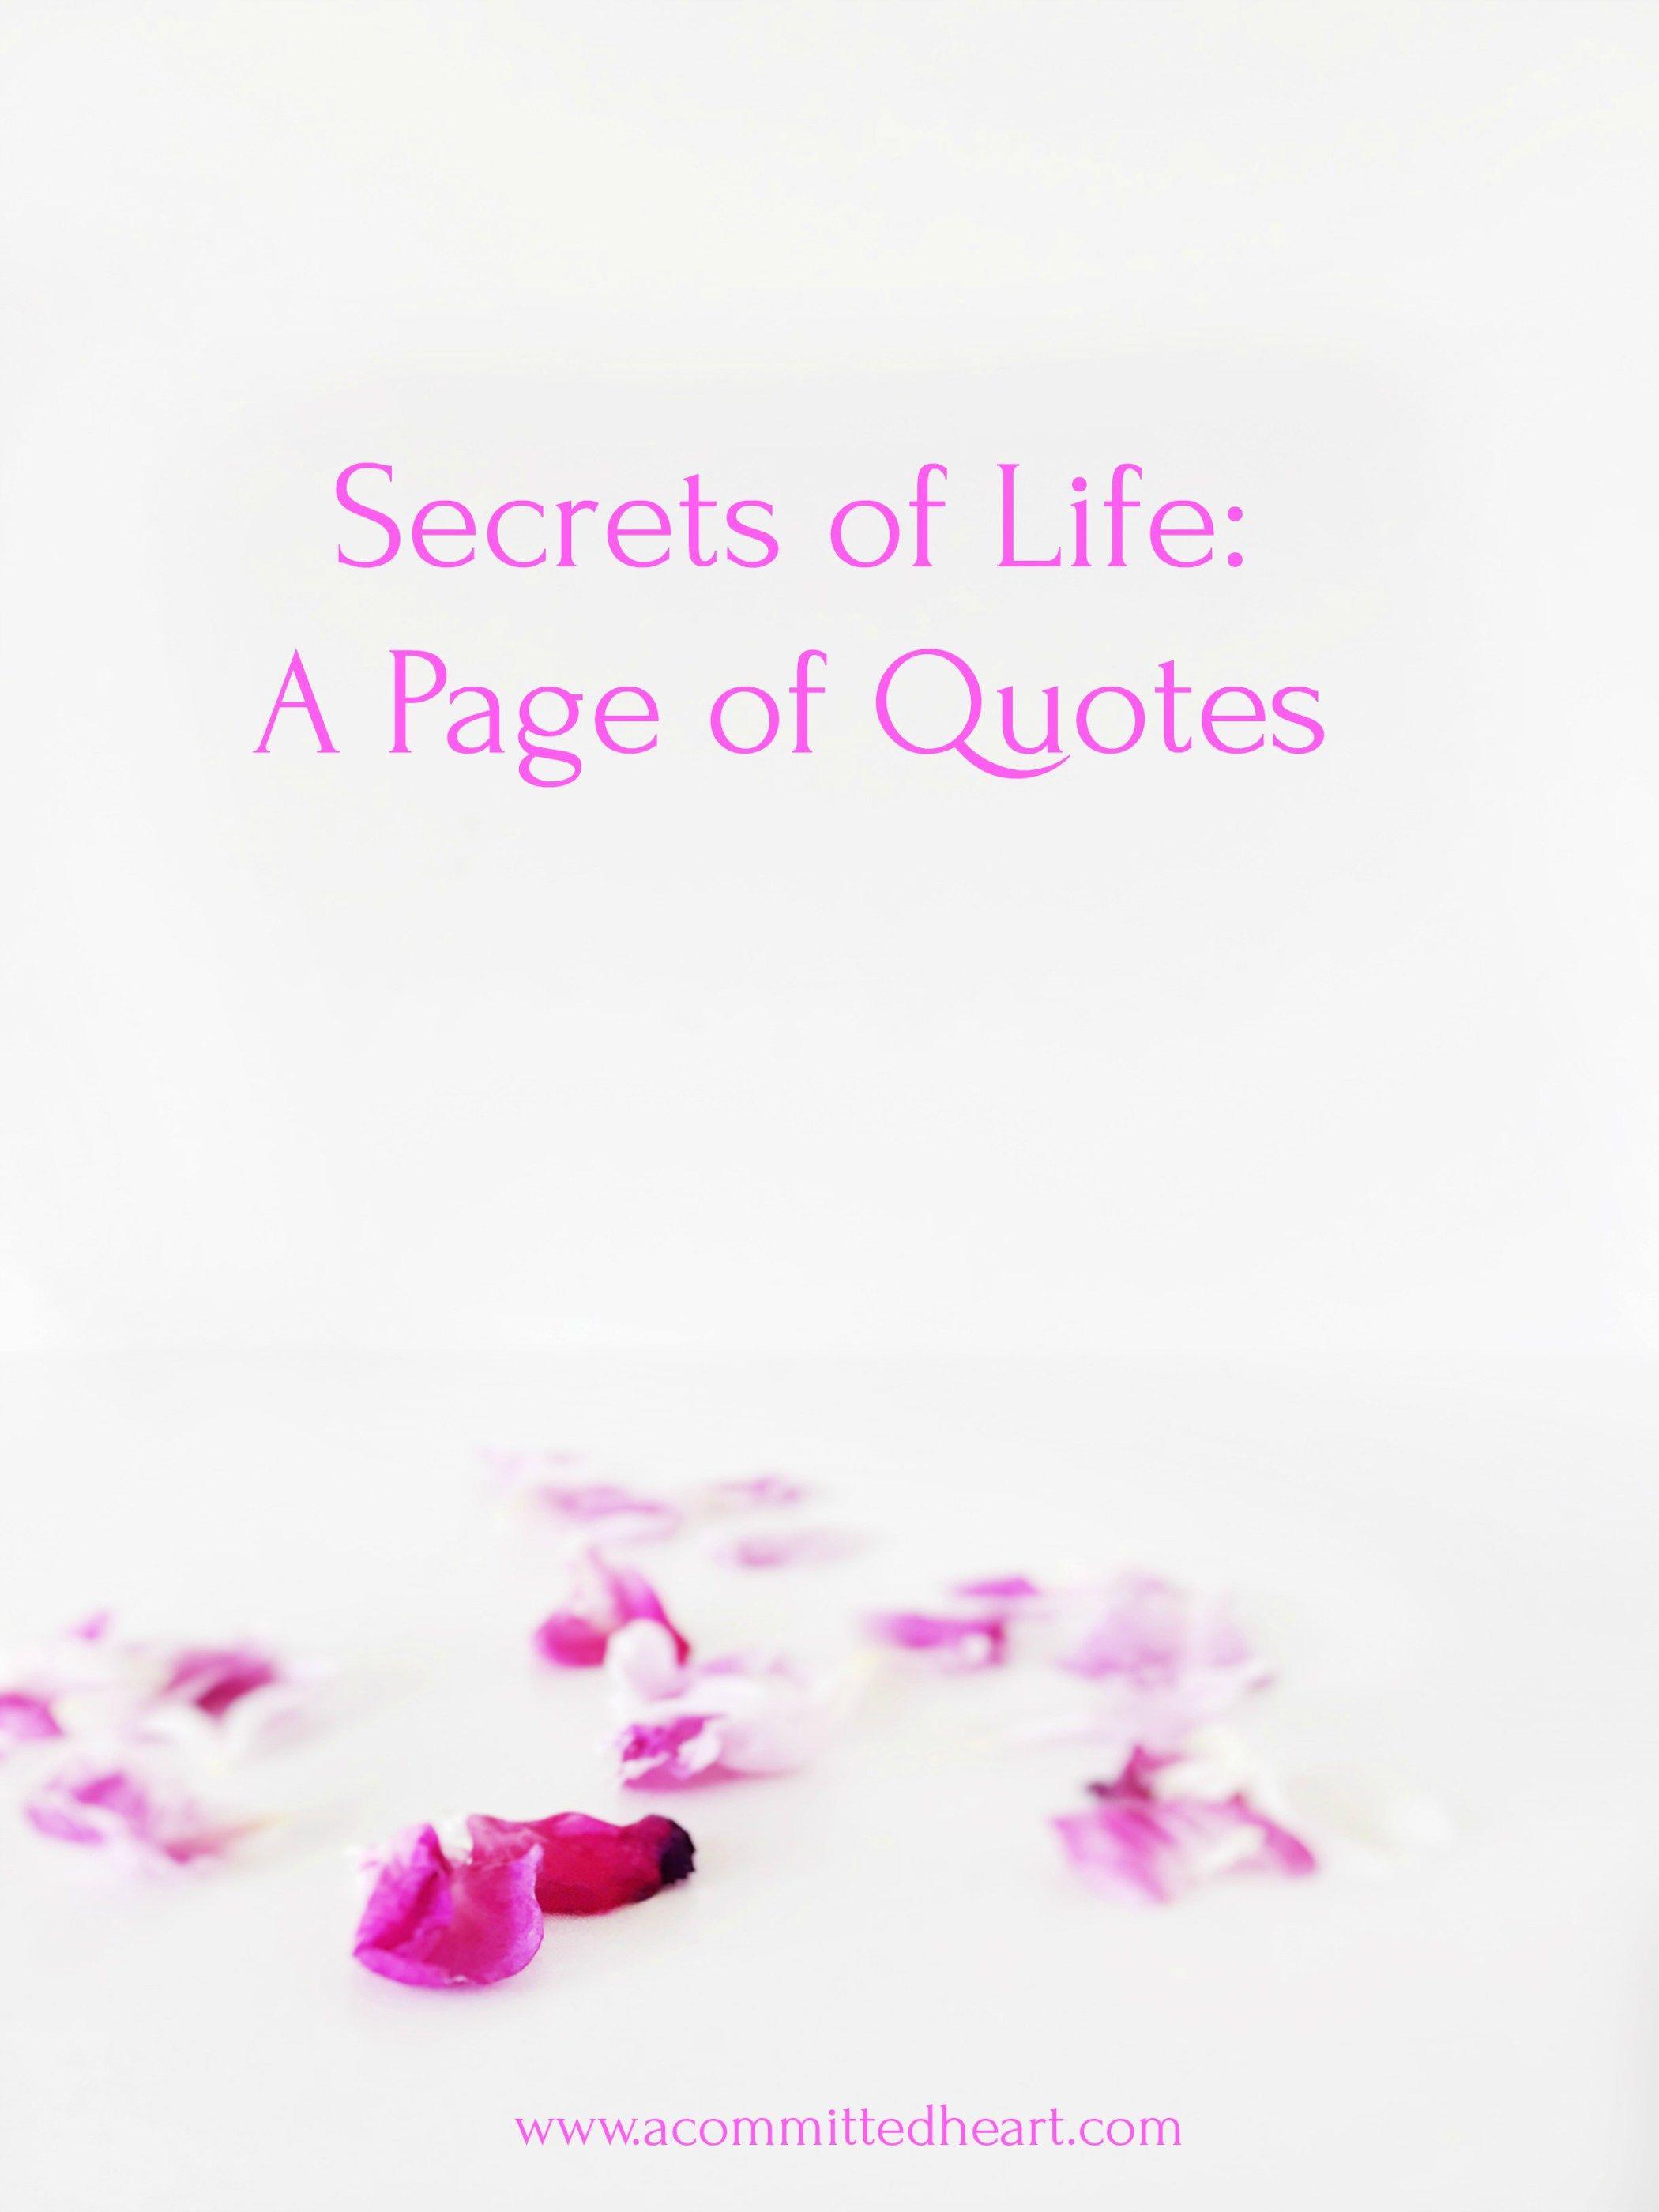 Secrets of life scheduled via tailwindapputmsource